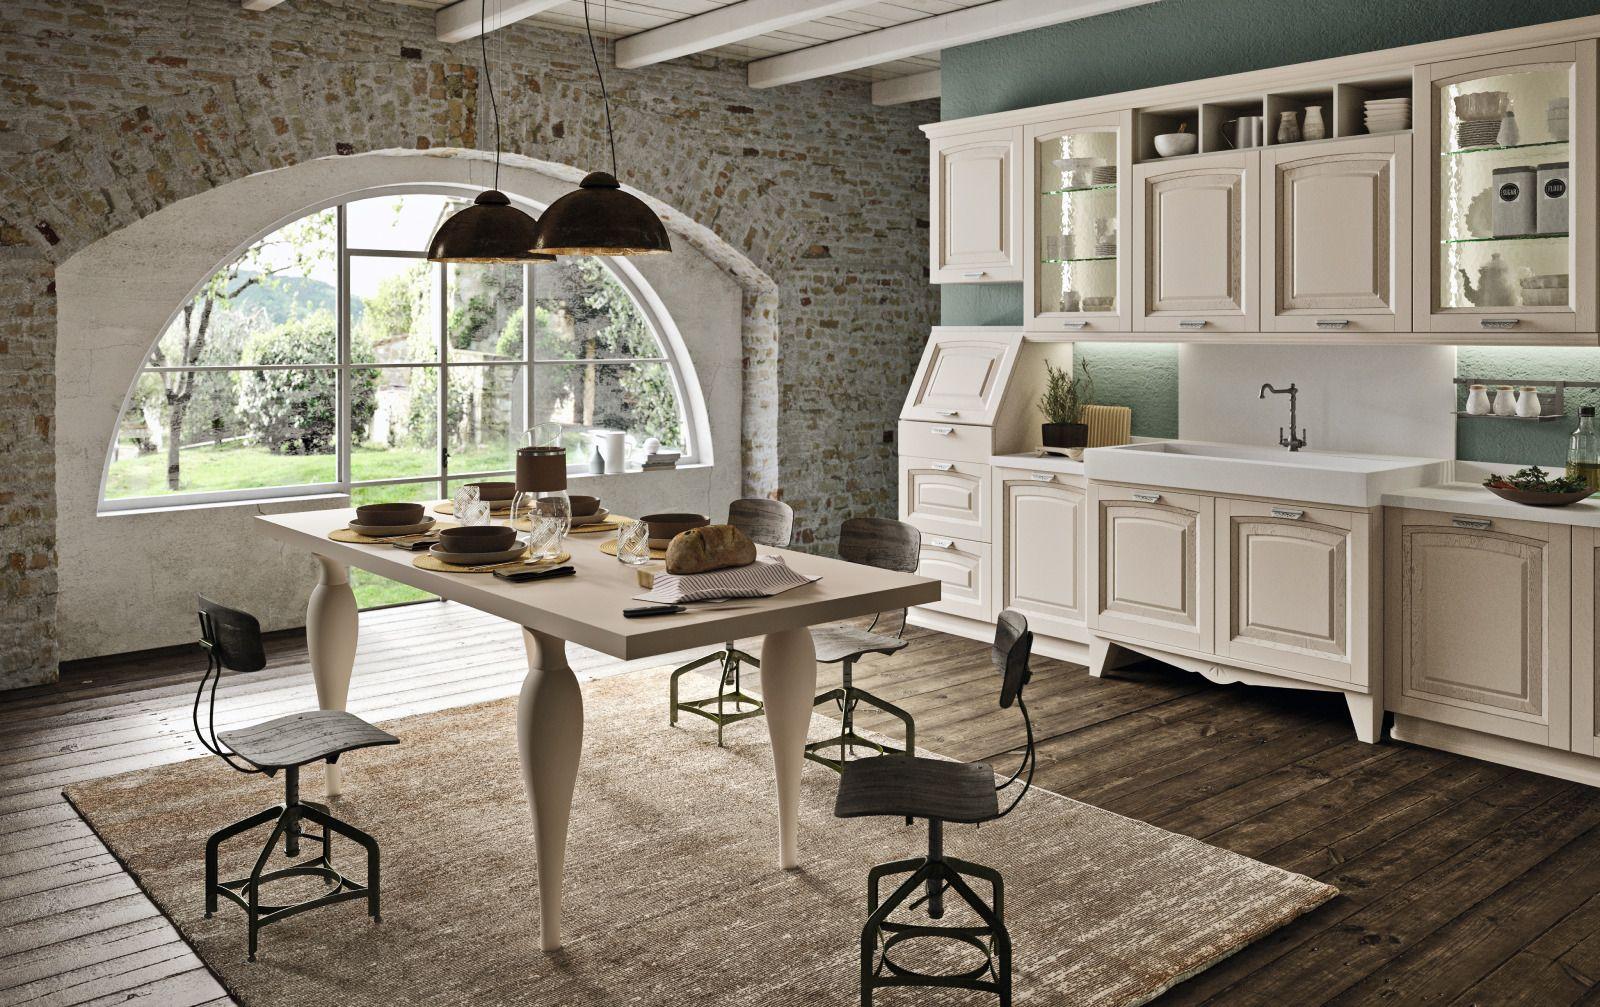 Case Arredate Con Gusto vendita mobili casa valle d'aosta - maison vive